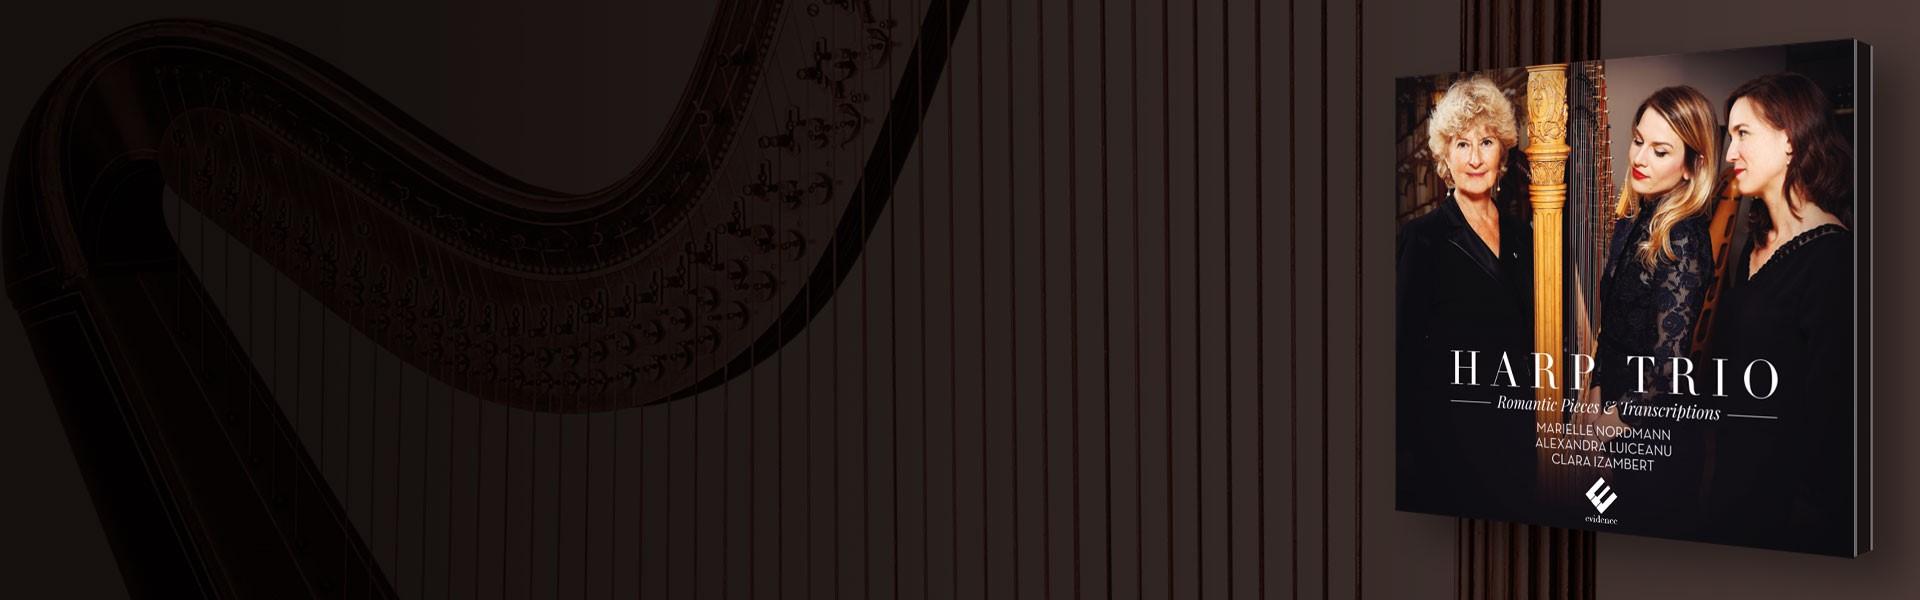 Harp Trio | Marielle Nordmann, Clara Izambert, Alexandra Luiceanu